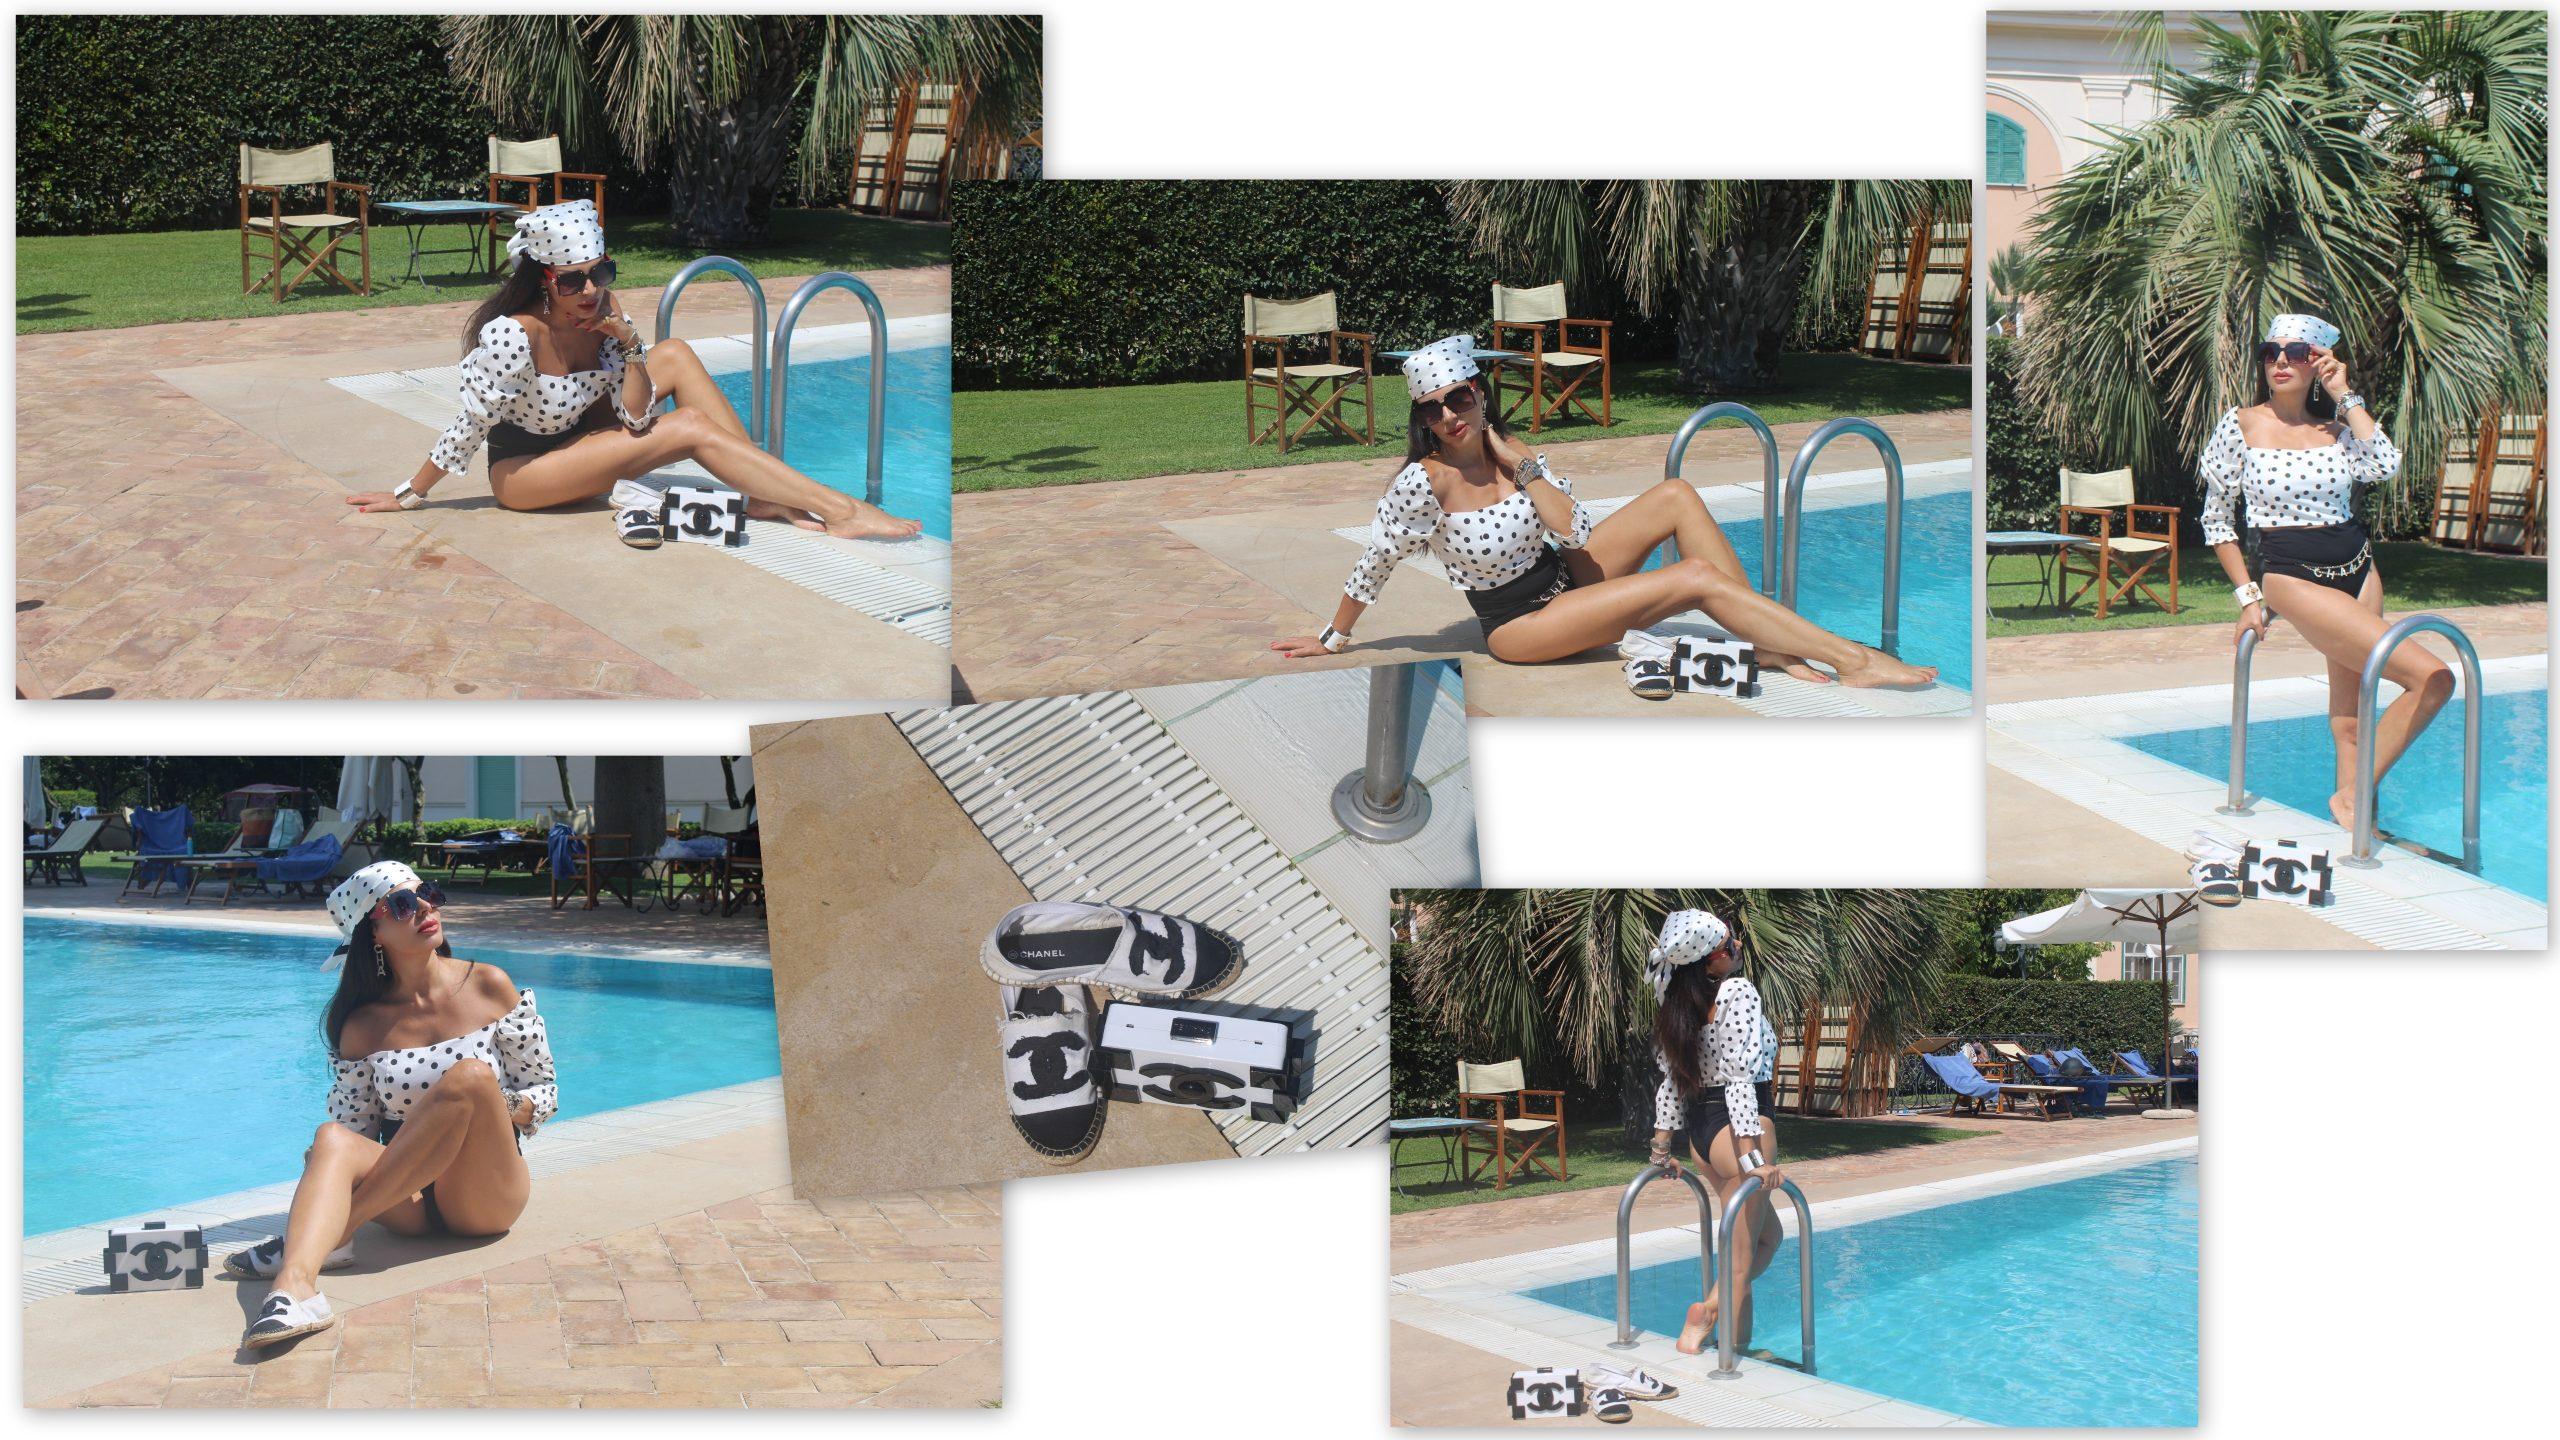 Summer Vacation Chanel beachwear lookbook black and white trend Gaeta Paola Lauretano